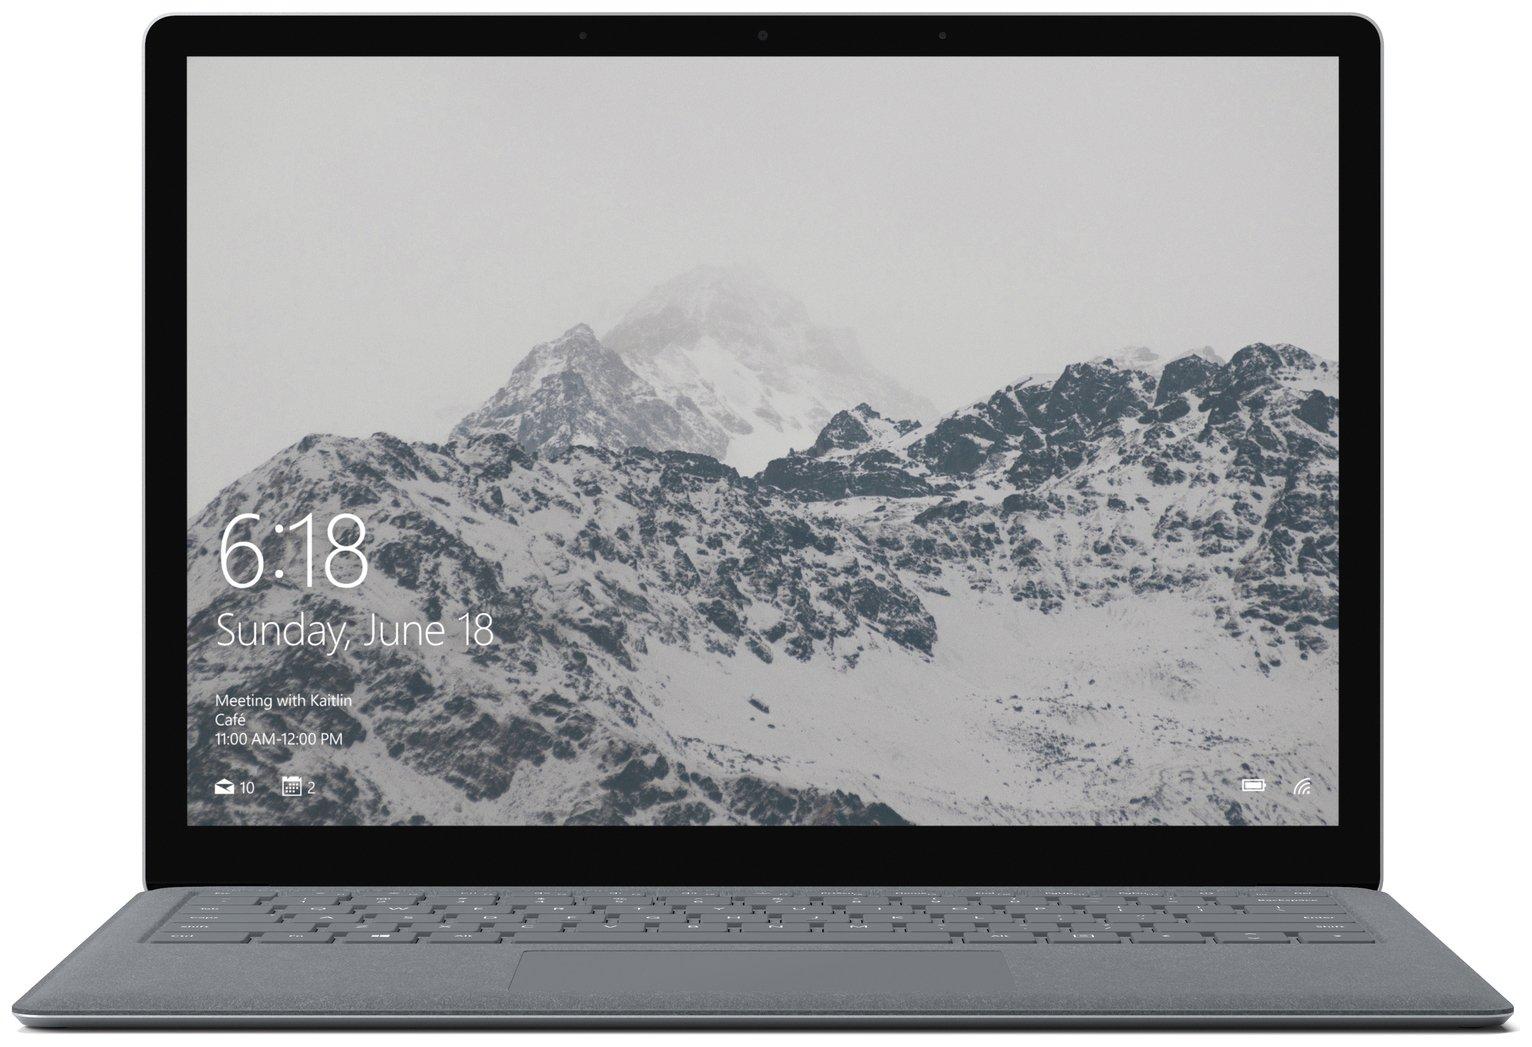 Microsoft surface Microsoft Surface i5 4GB 128GB Laptop